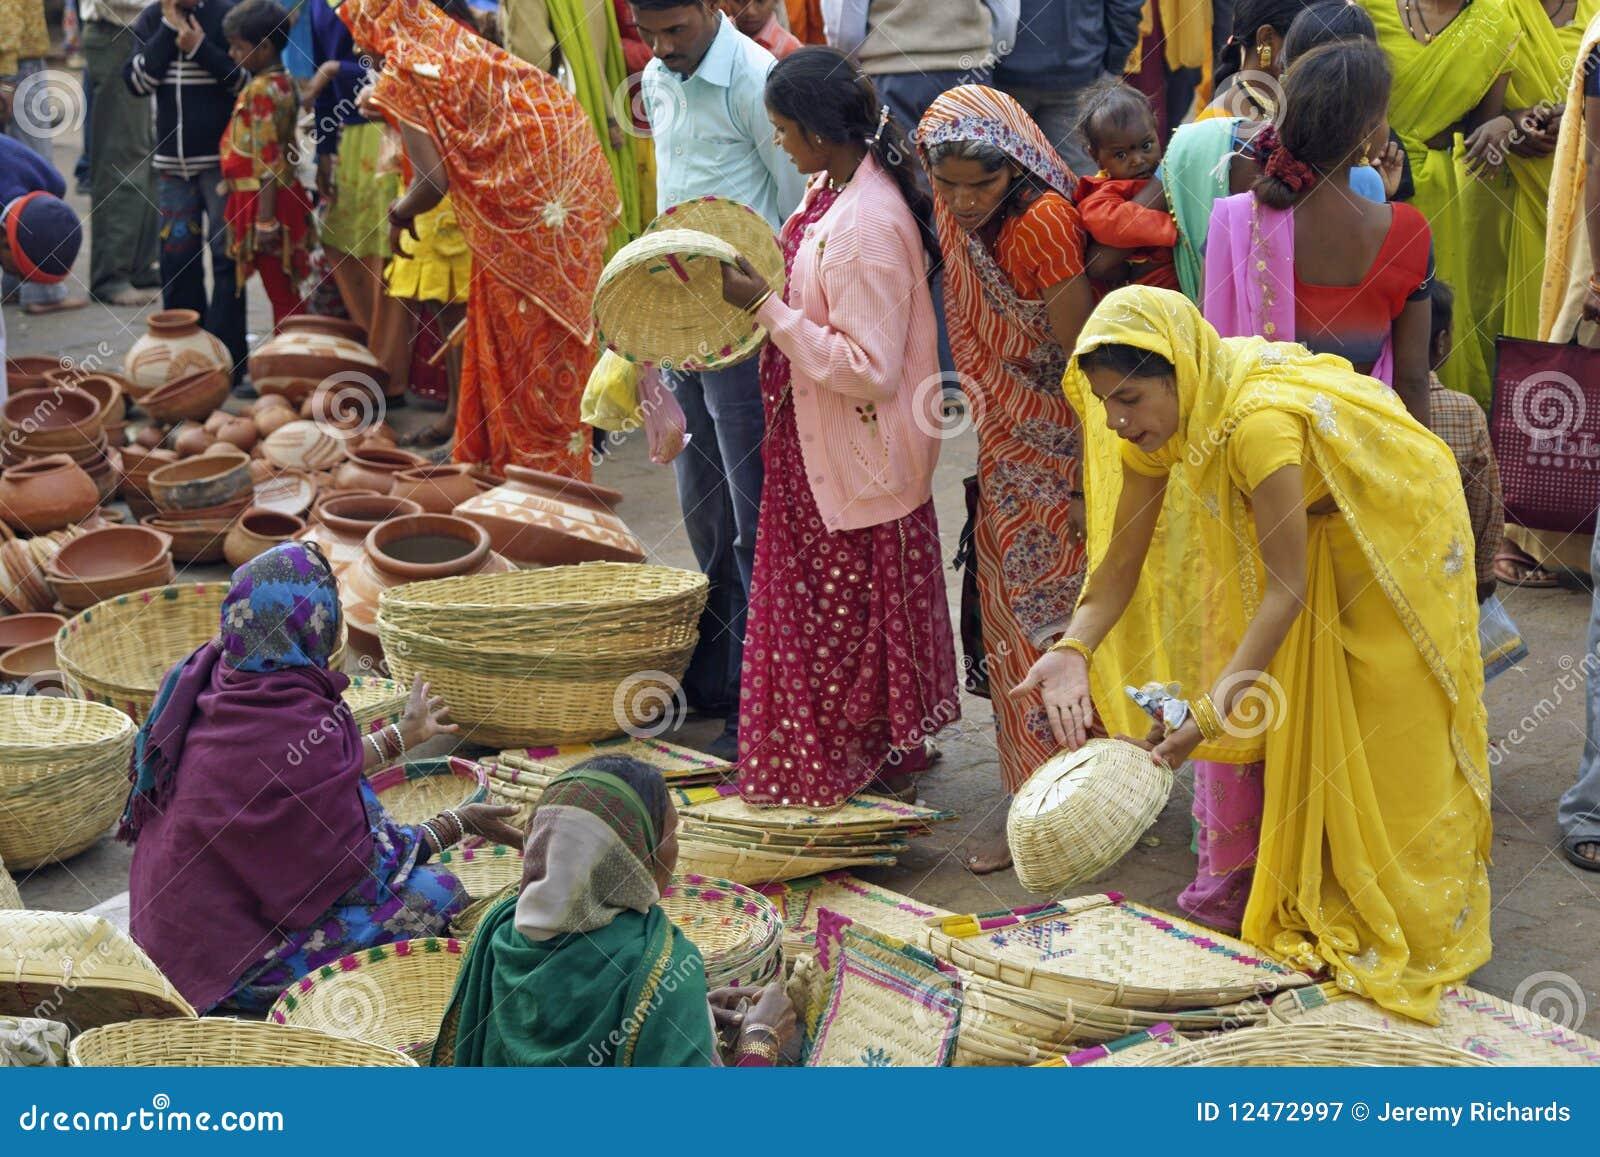 Indian Market Indian Market Editorial